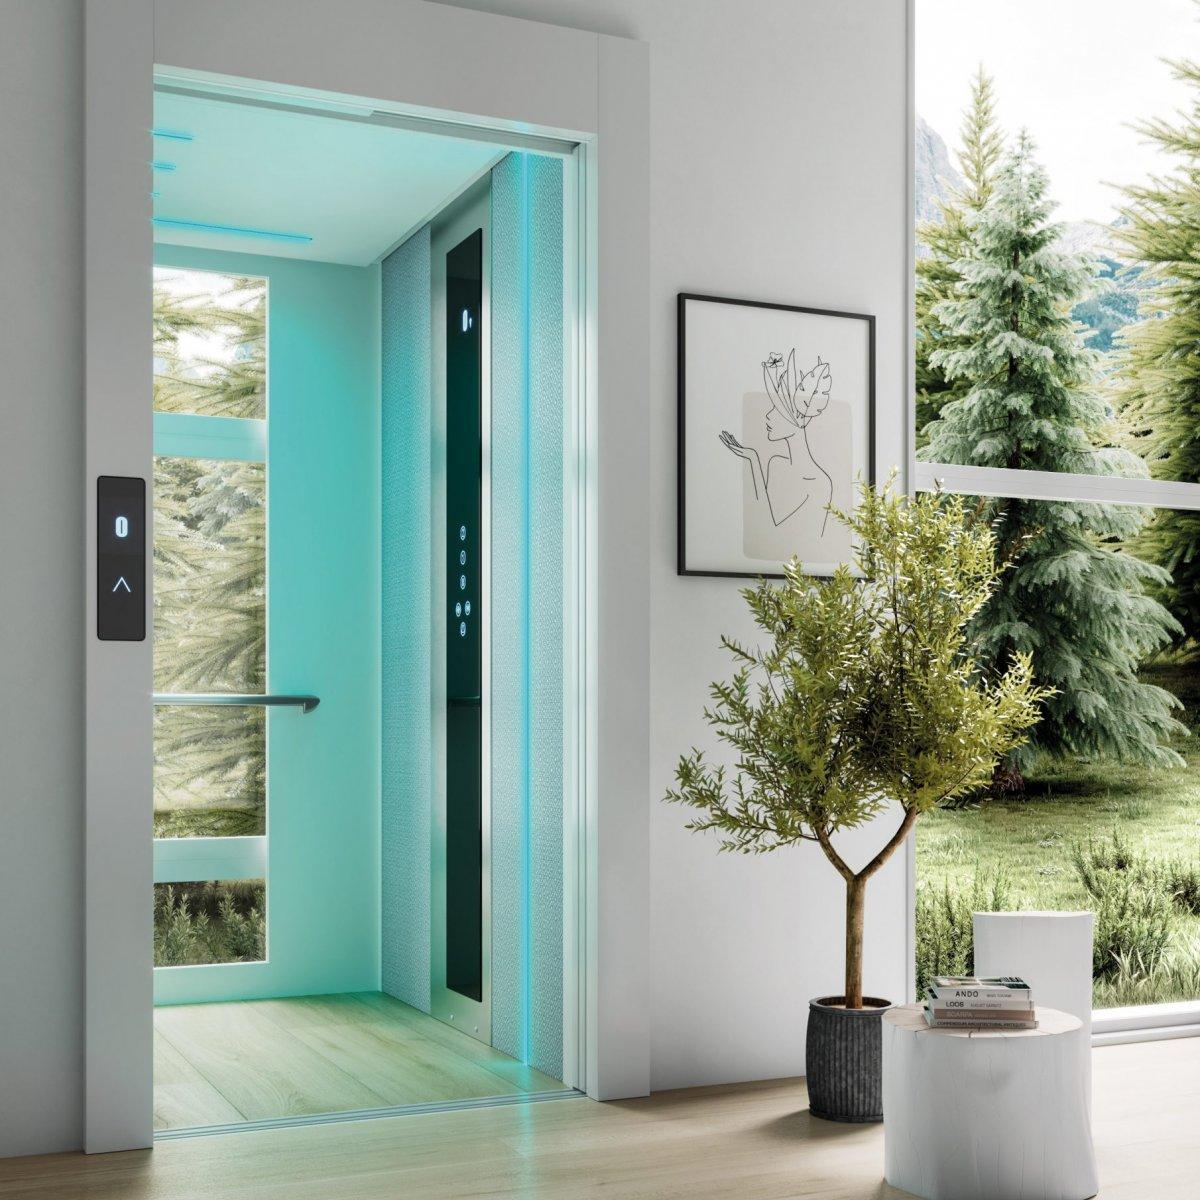 Home Lift   Simplex Elevators Gallery Image 1